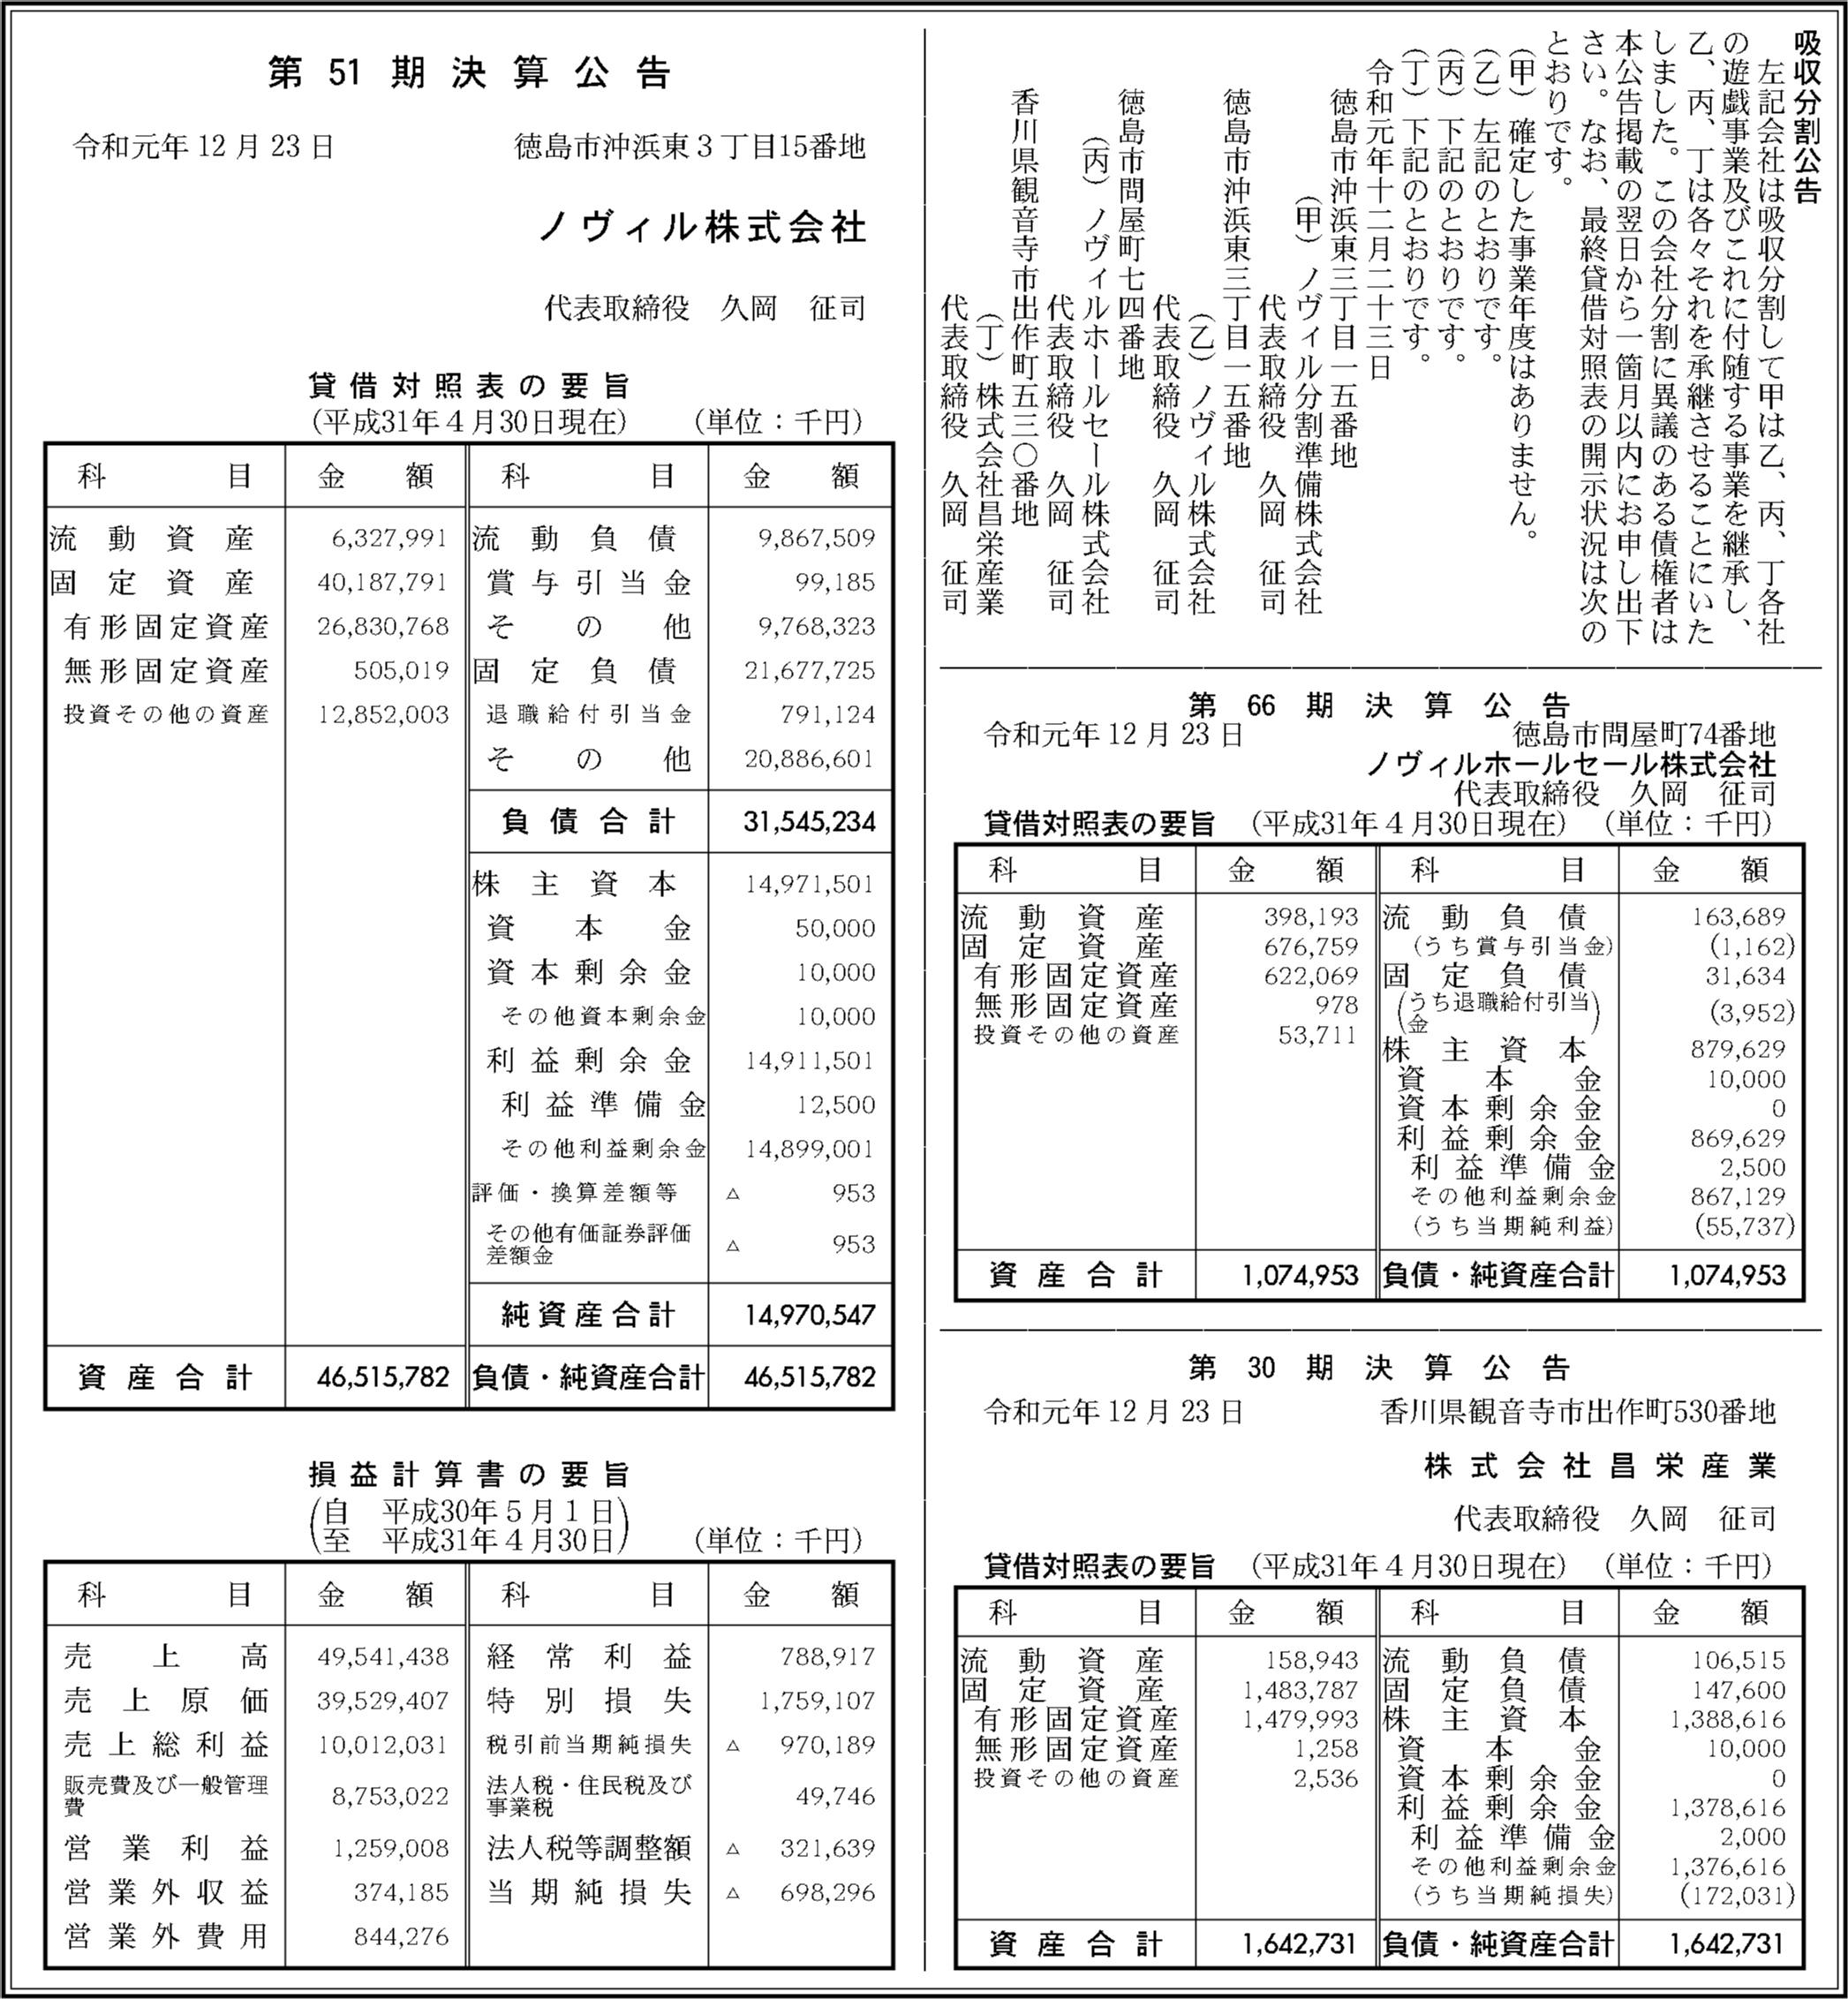 0096 2ebabb1d427429562ef0c4738bf9be3768d3fbe671697e99584e170f35bd8764ec0fc8091061ee7d59cbc889bf534f065901a664a4d61b5edd5d44cb4a177ee0 02